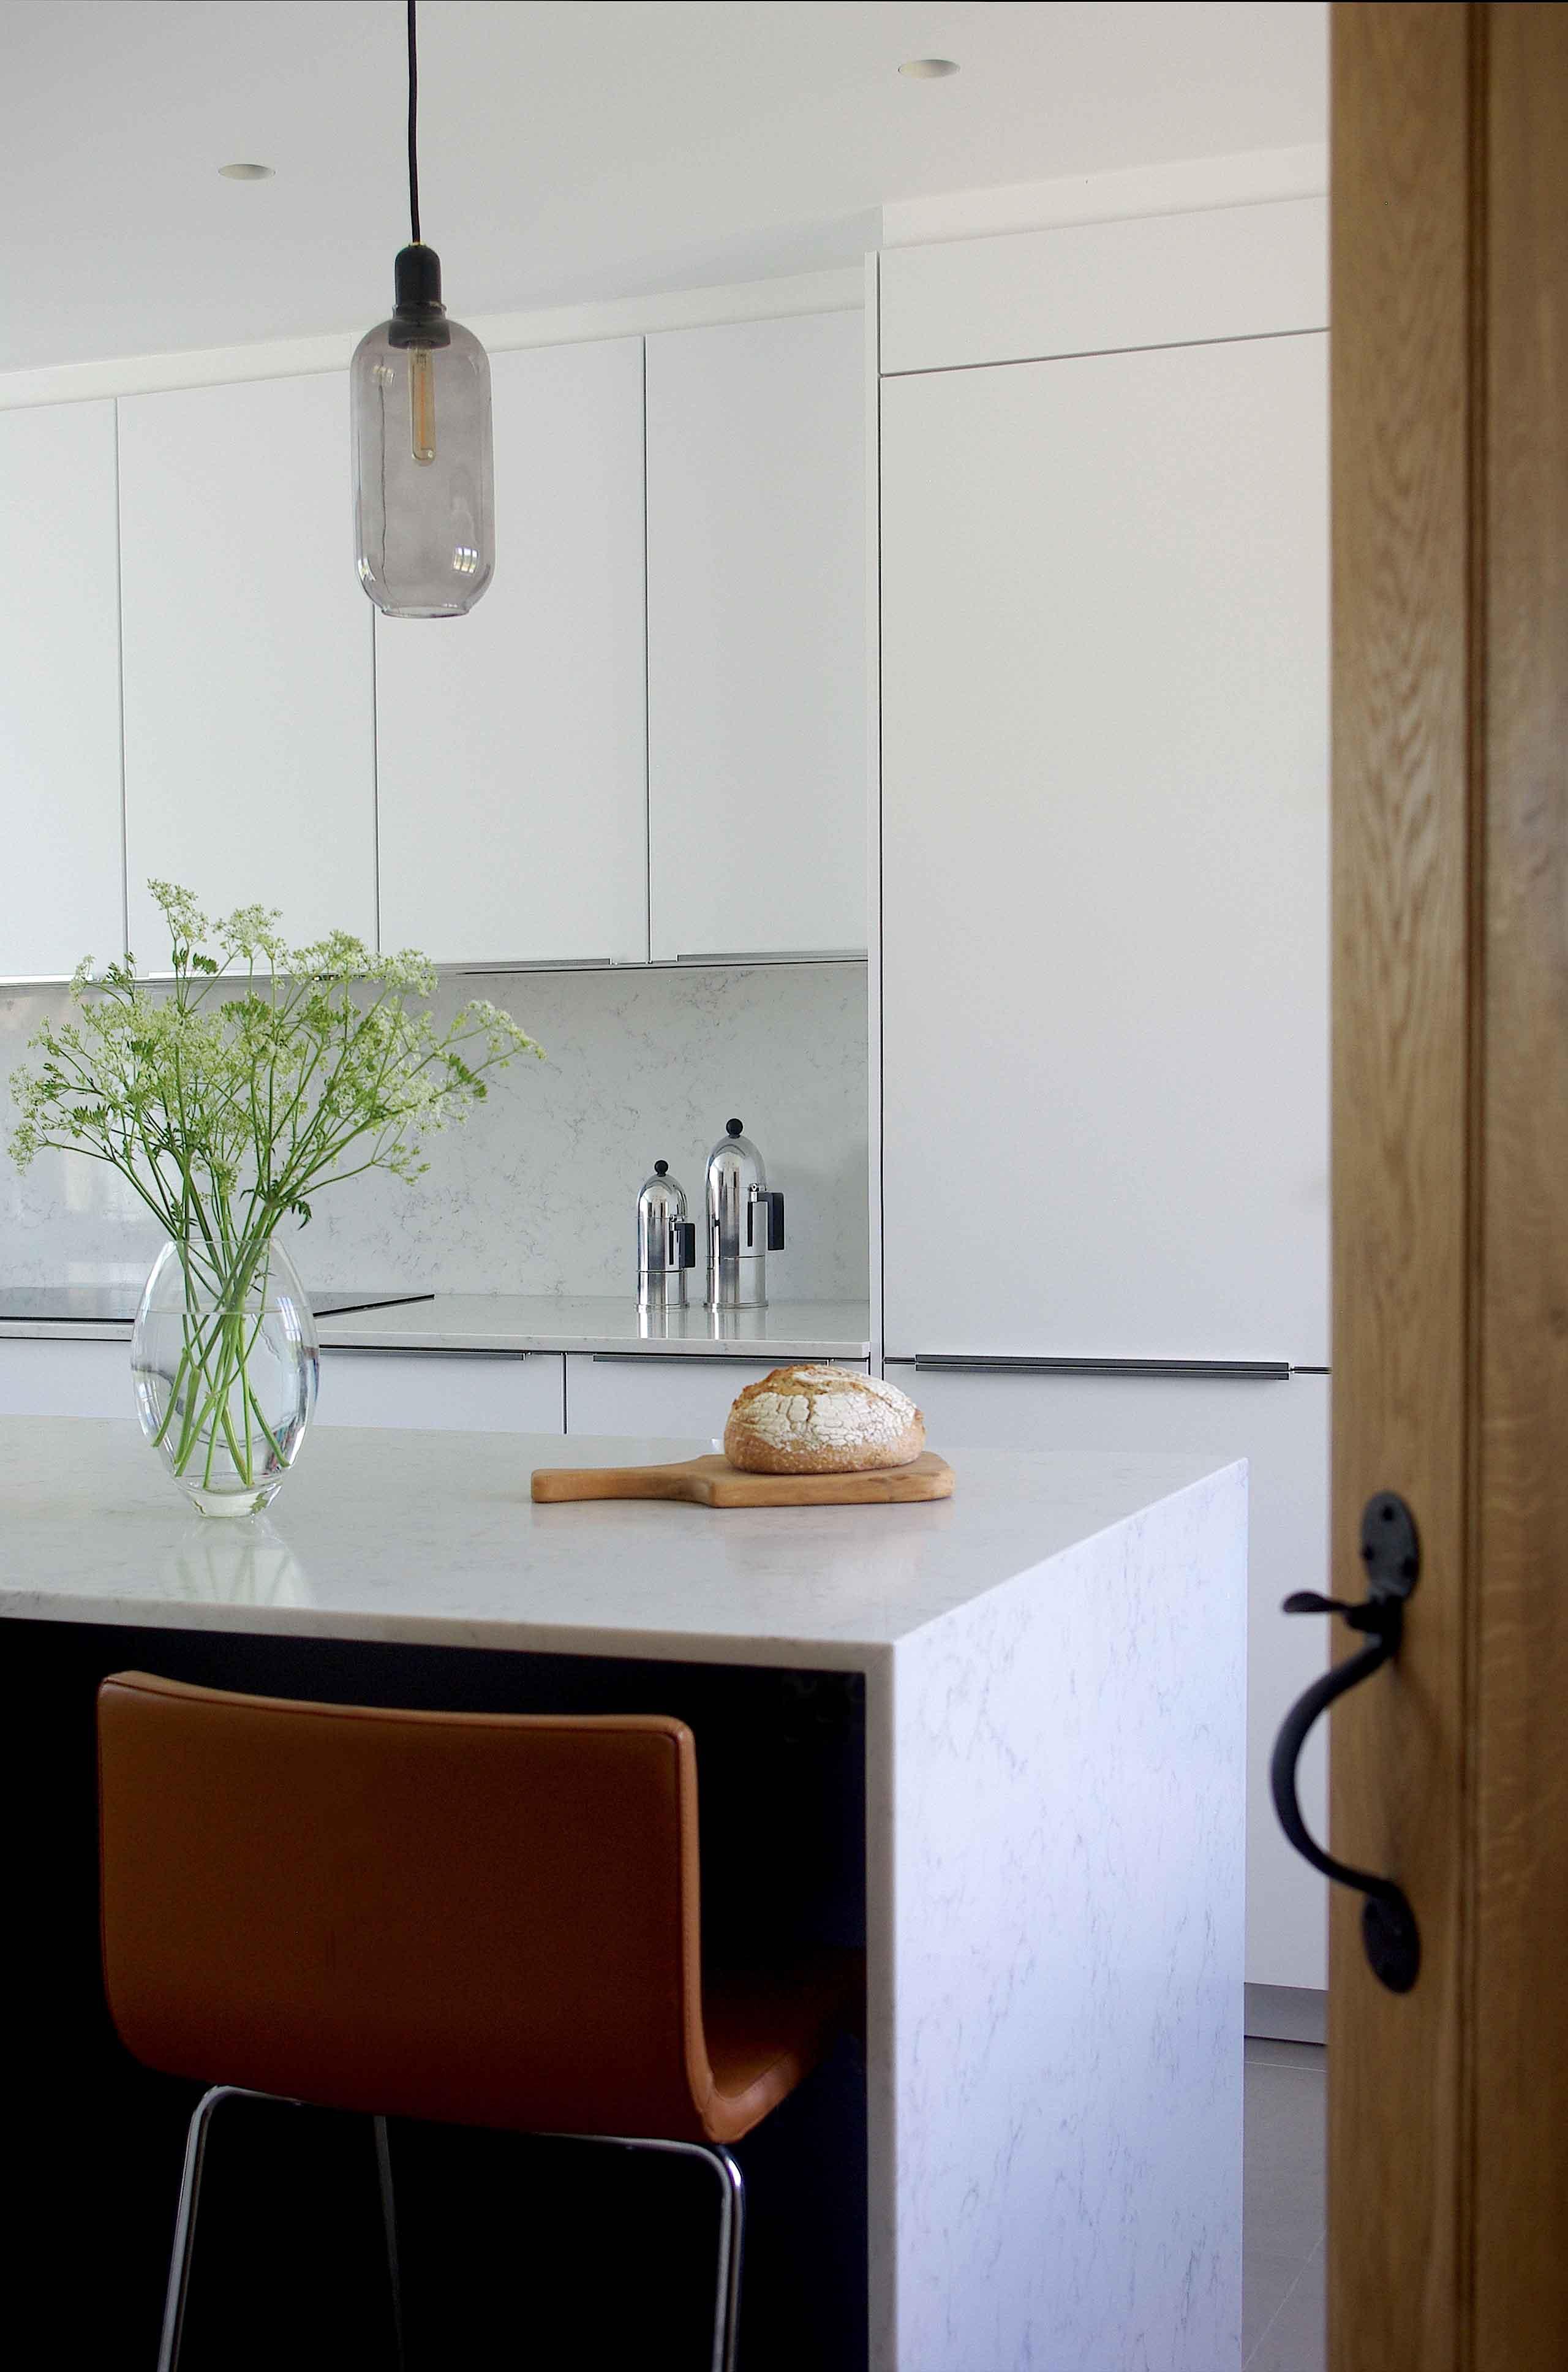 Hall-to-Kitchen